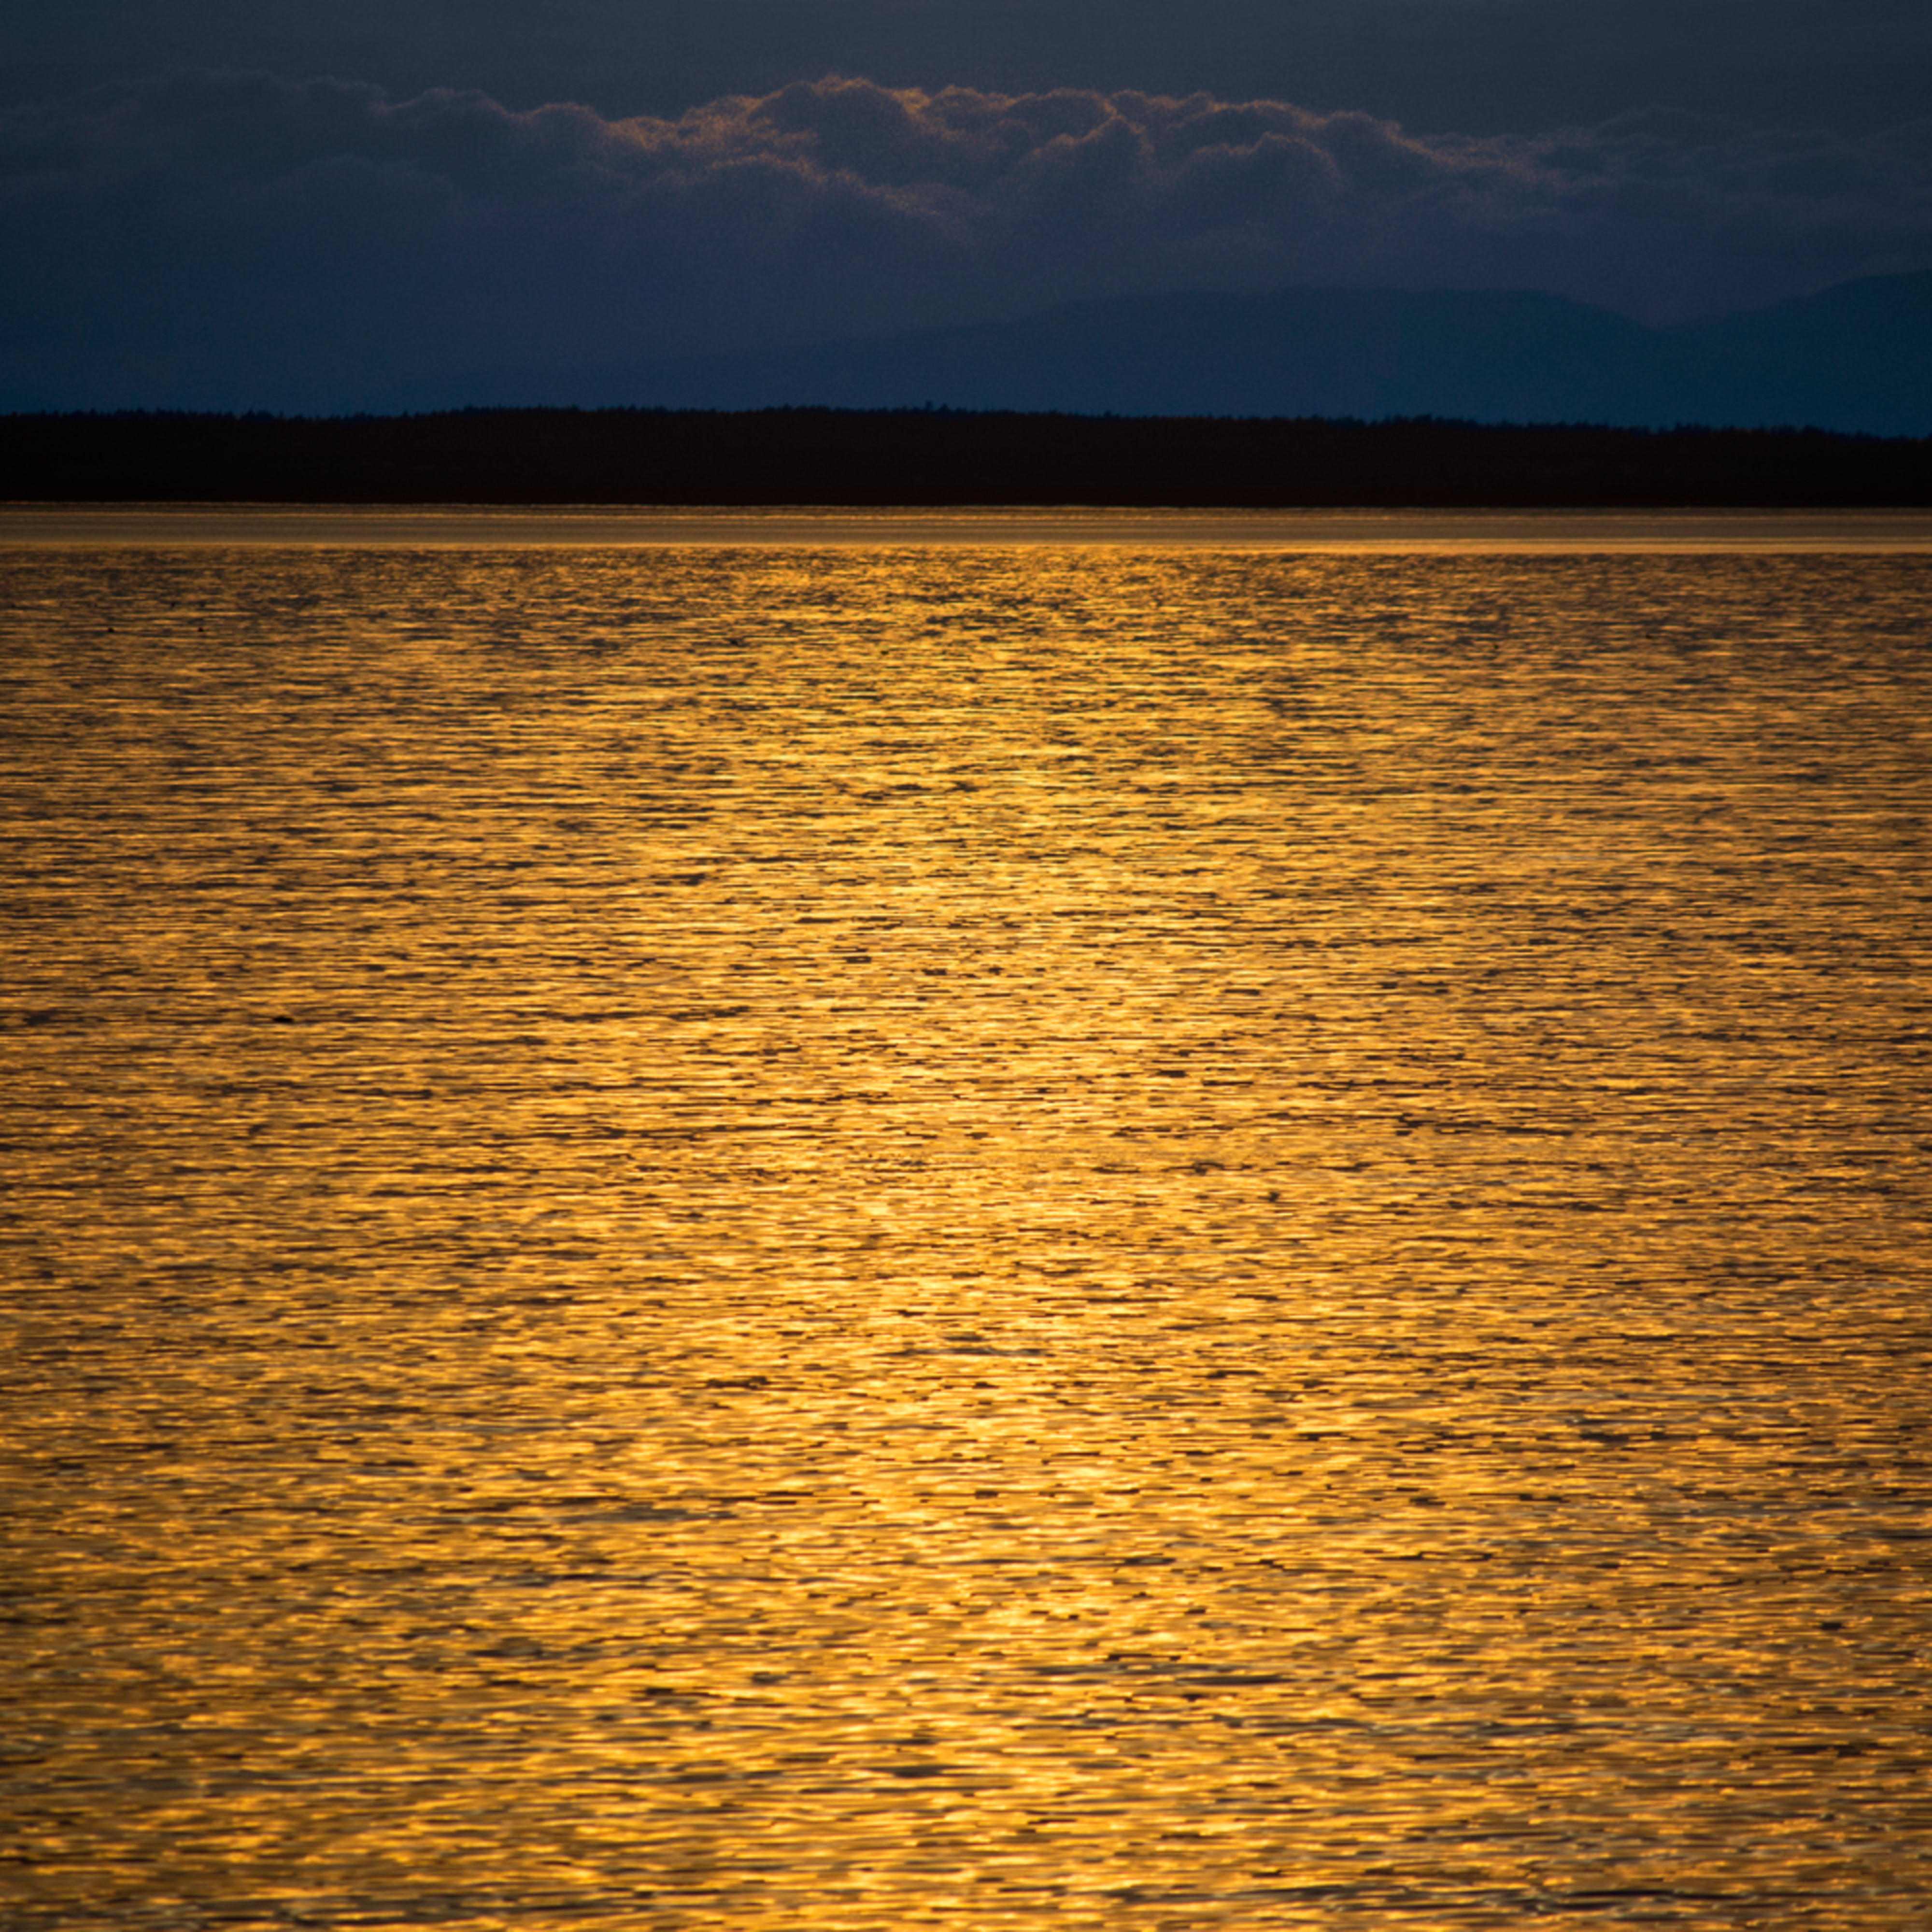 Golden seas wn6alm